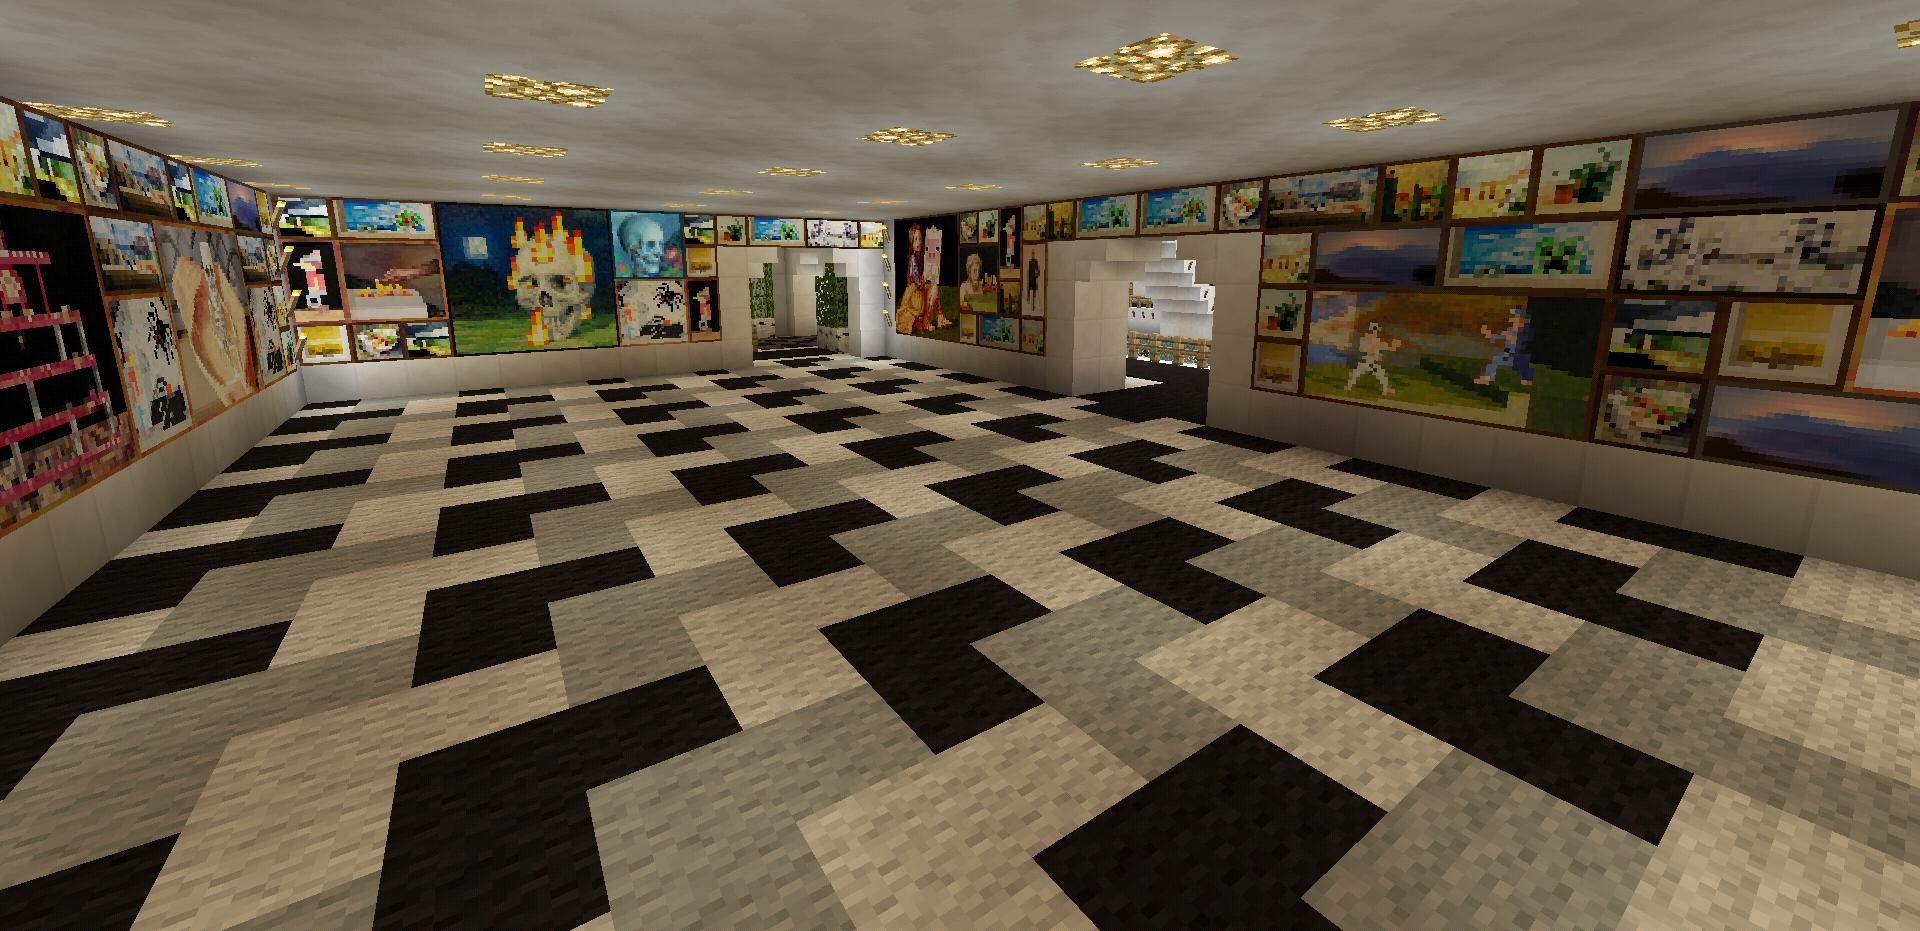 minecraft art room and decor carpet design creations | minecraft